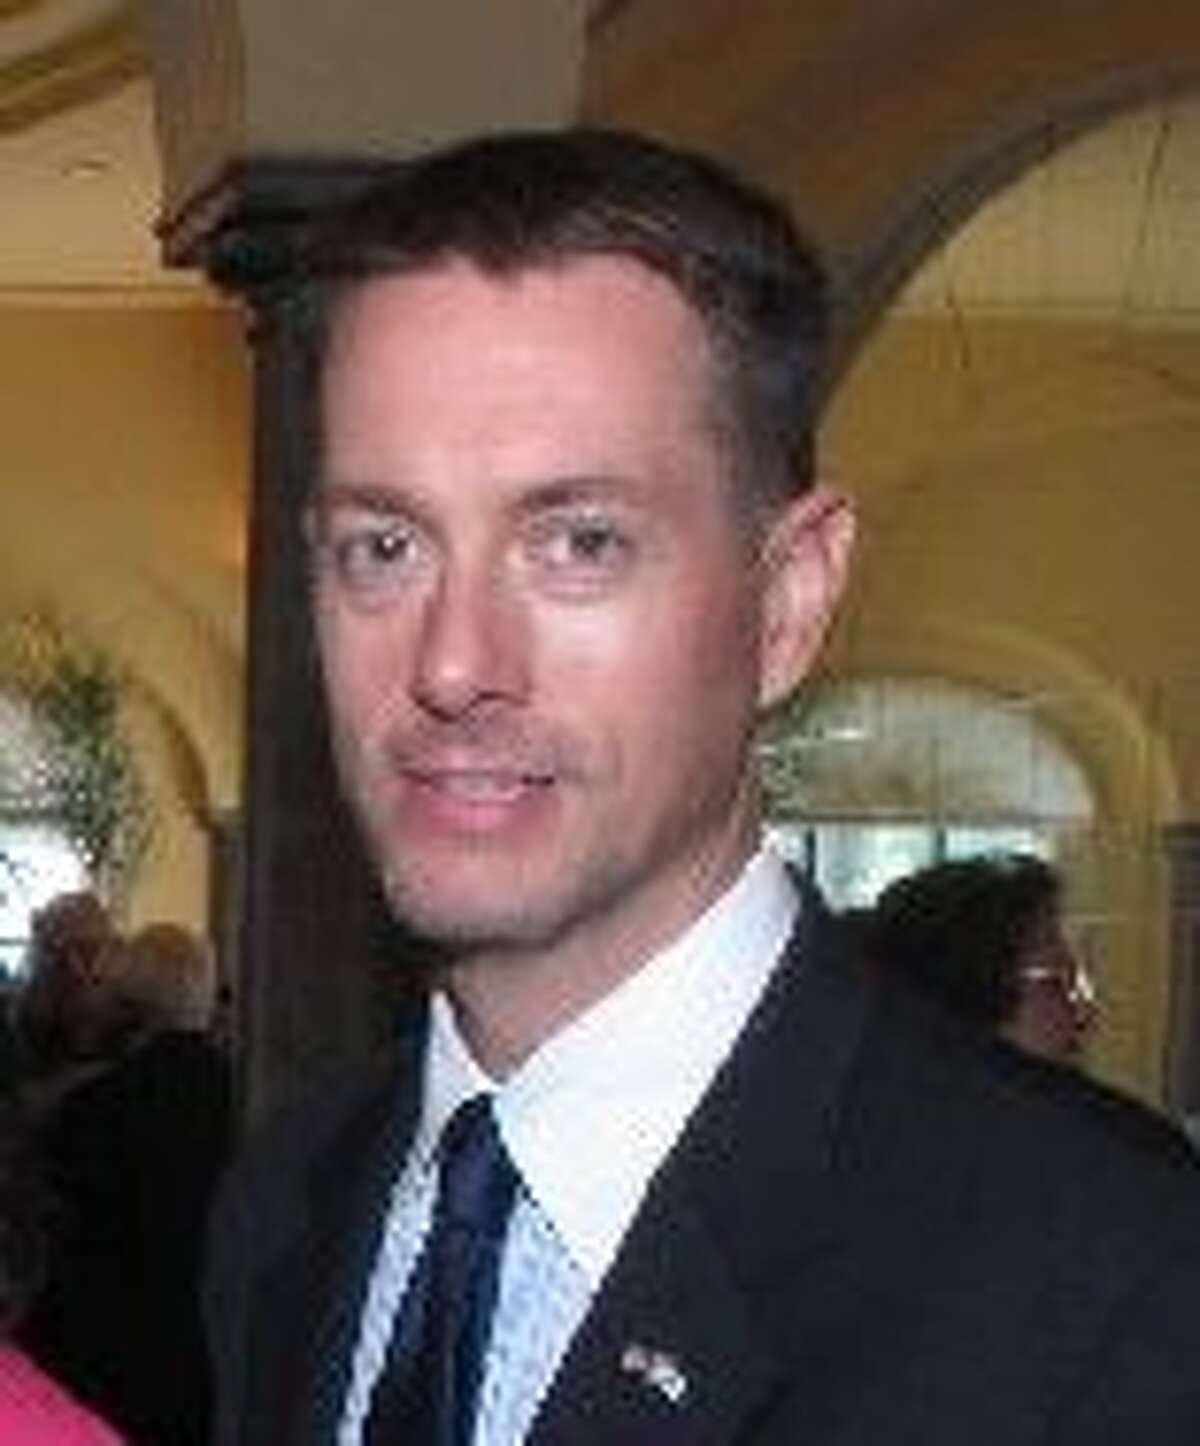 Bill Day is a spokesman for San Antonio-based Valero Energy Corp.